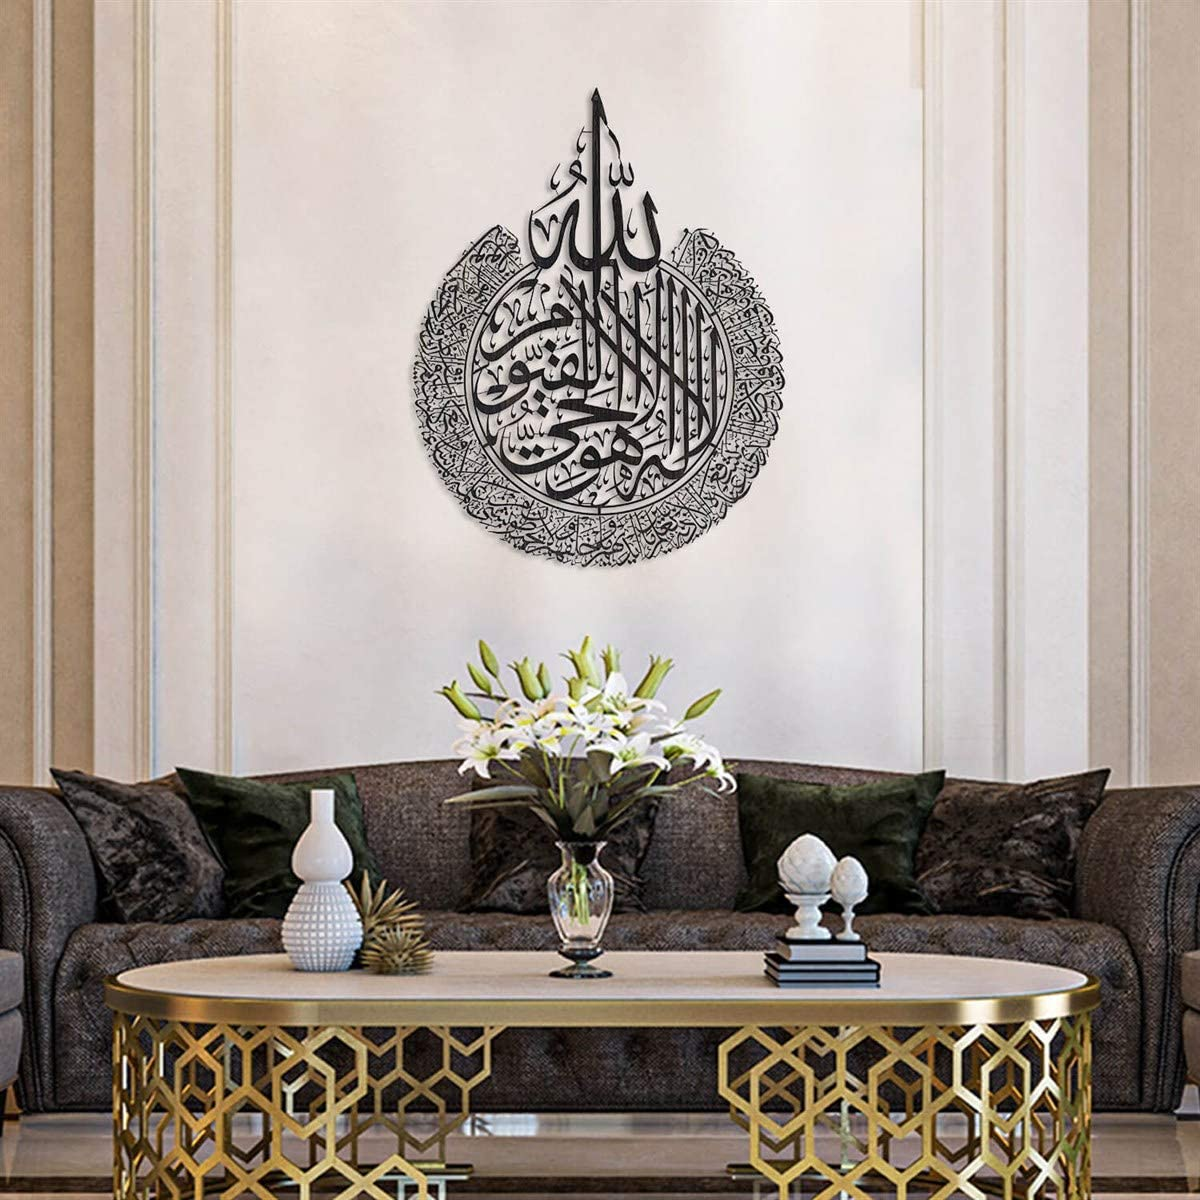 Tubibu %100 Metal Islamic Wall Art, Islamic Wall Decor, Gift for